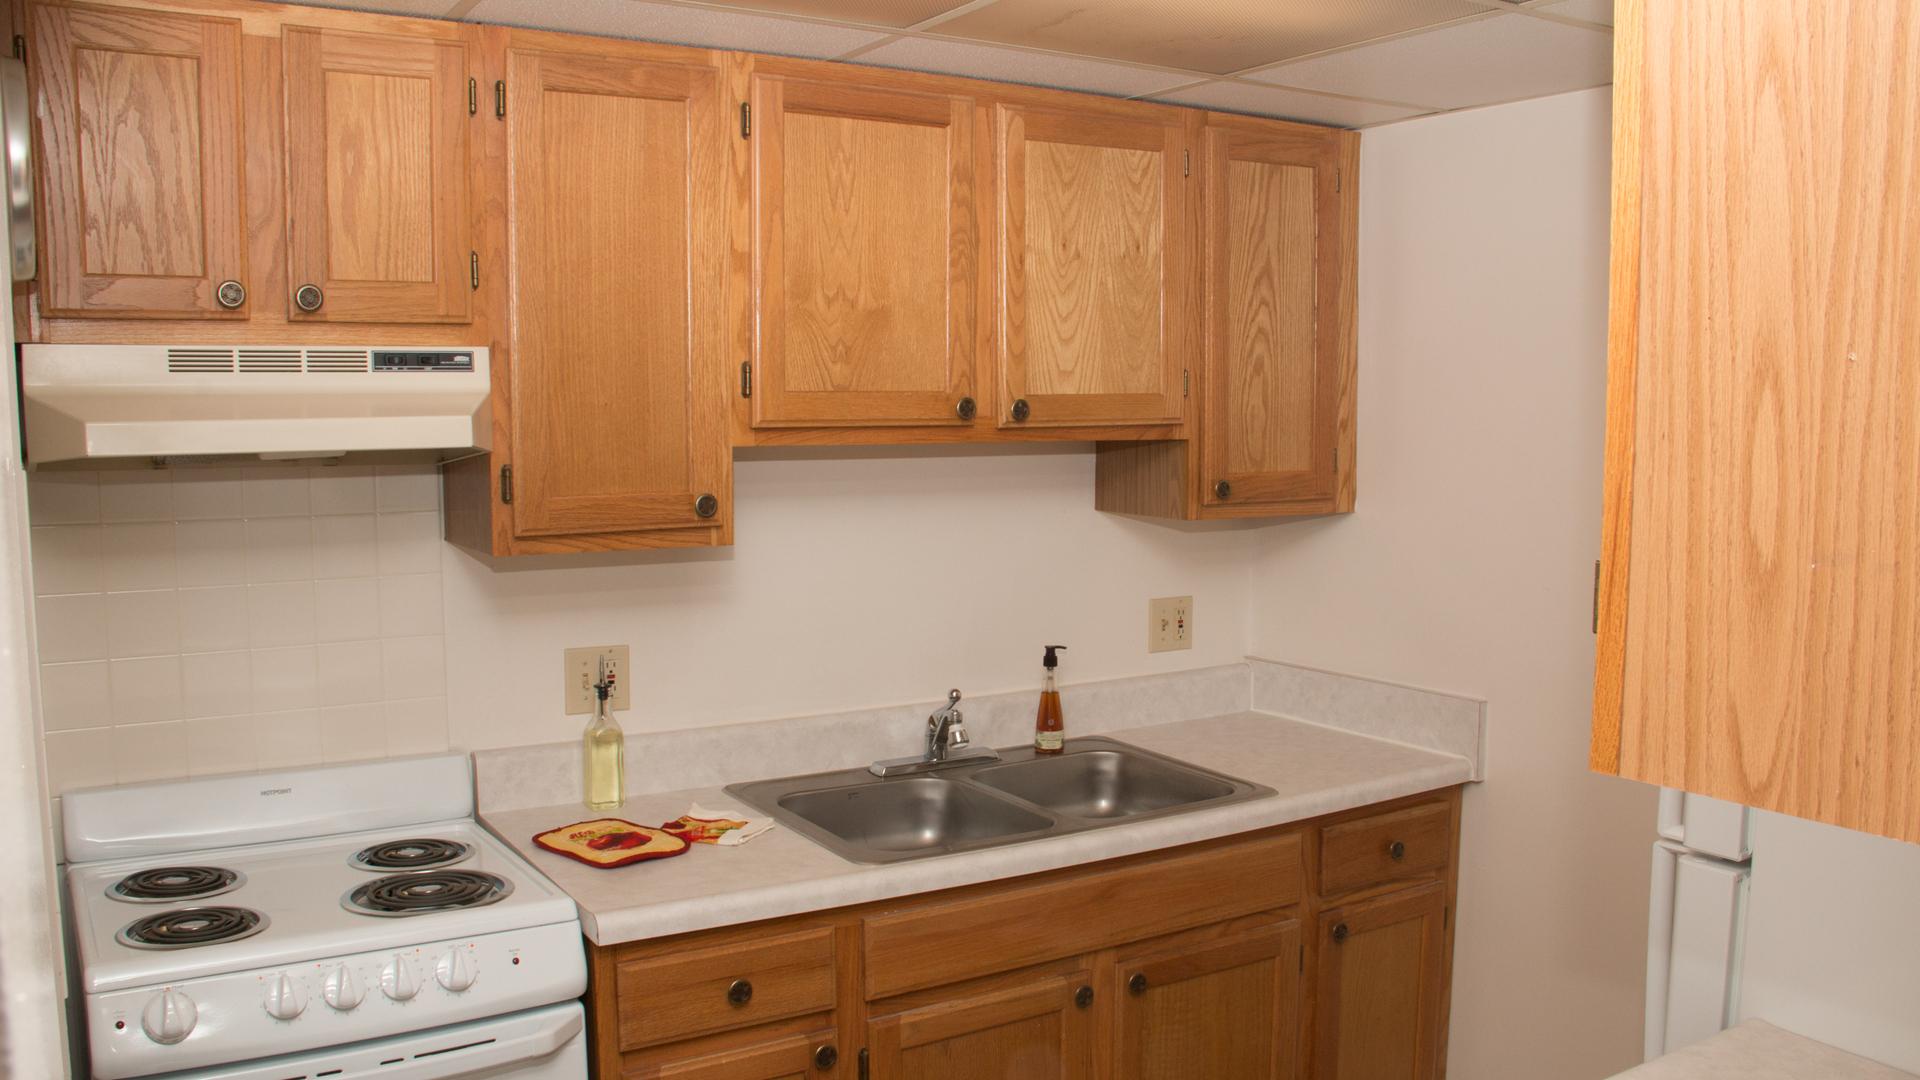 Craigslist flint kitchen cabinets - Photo Tour